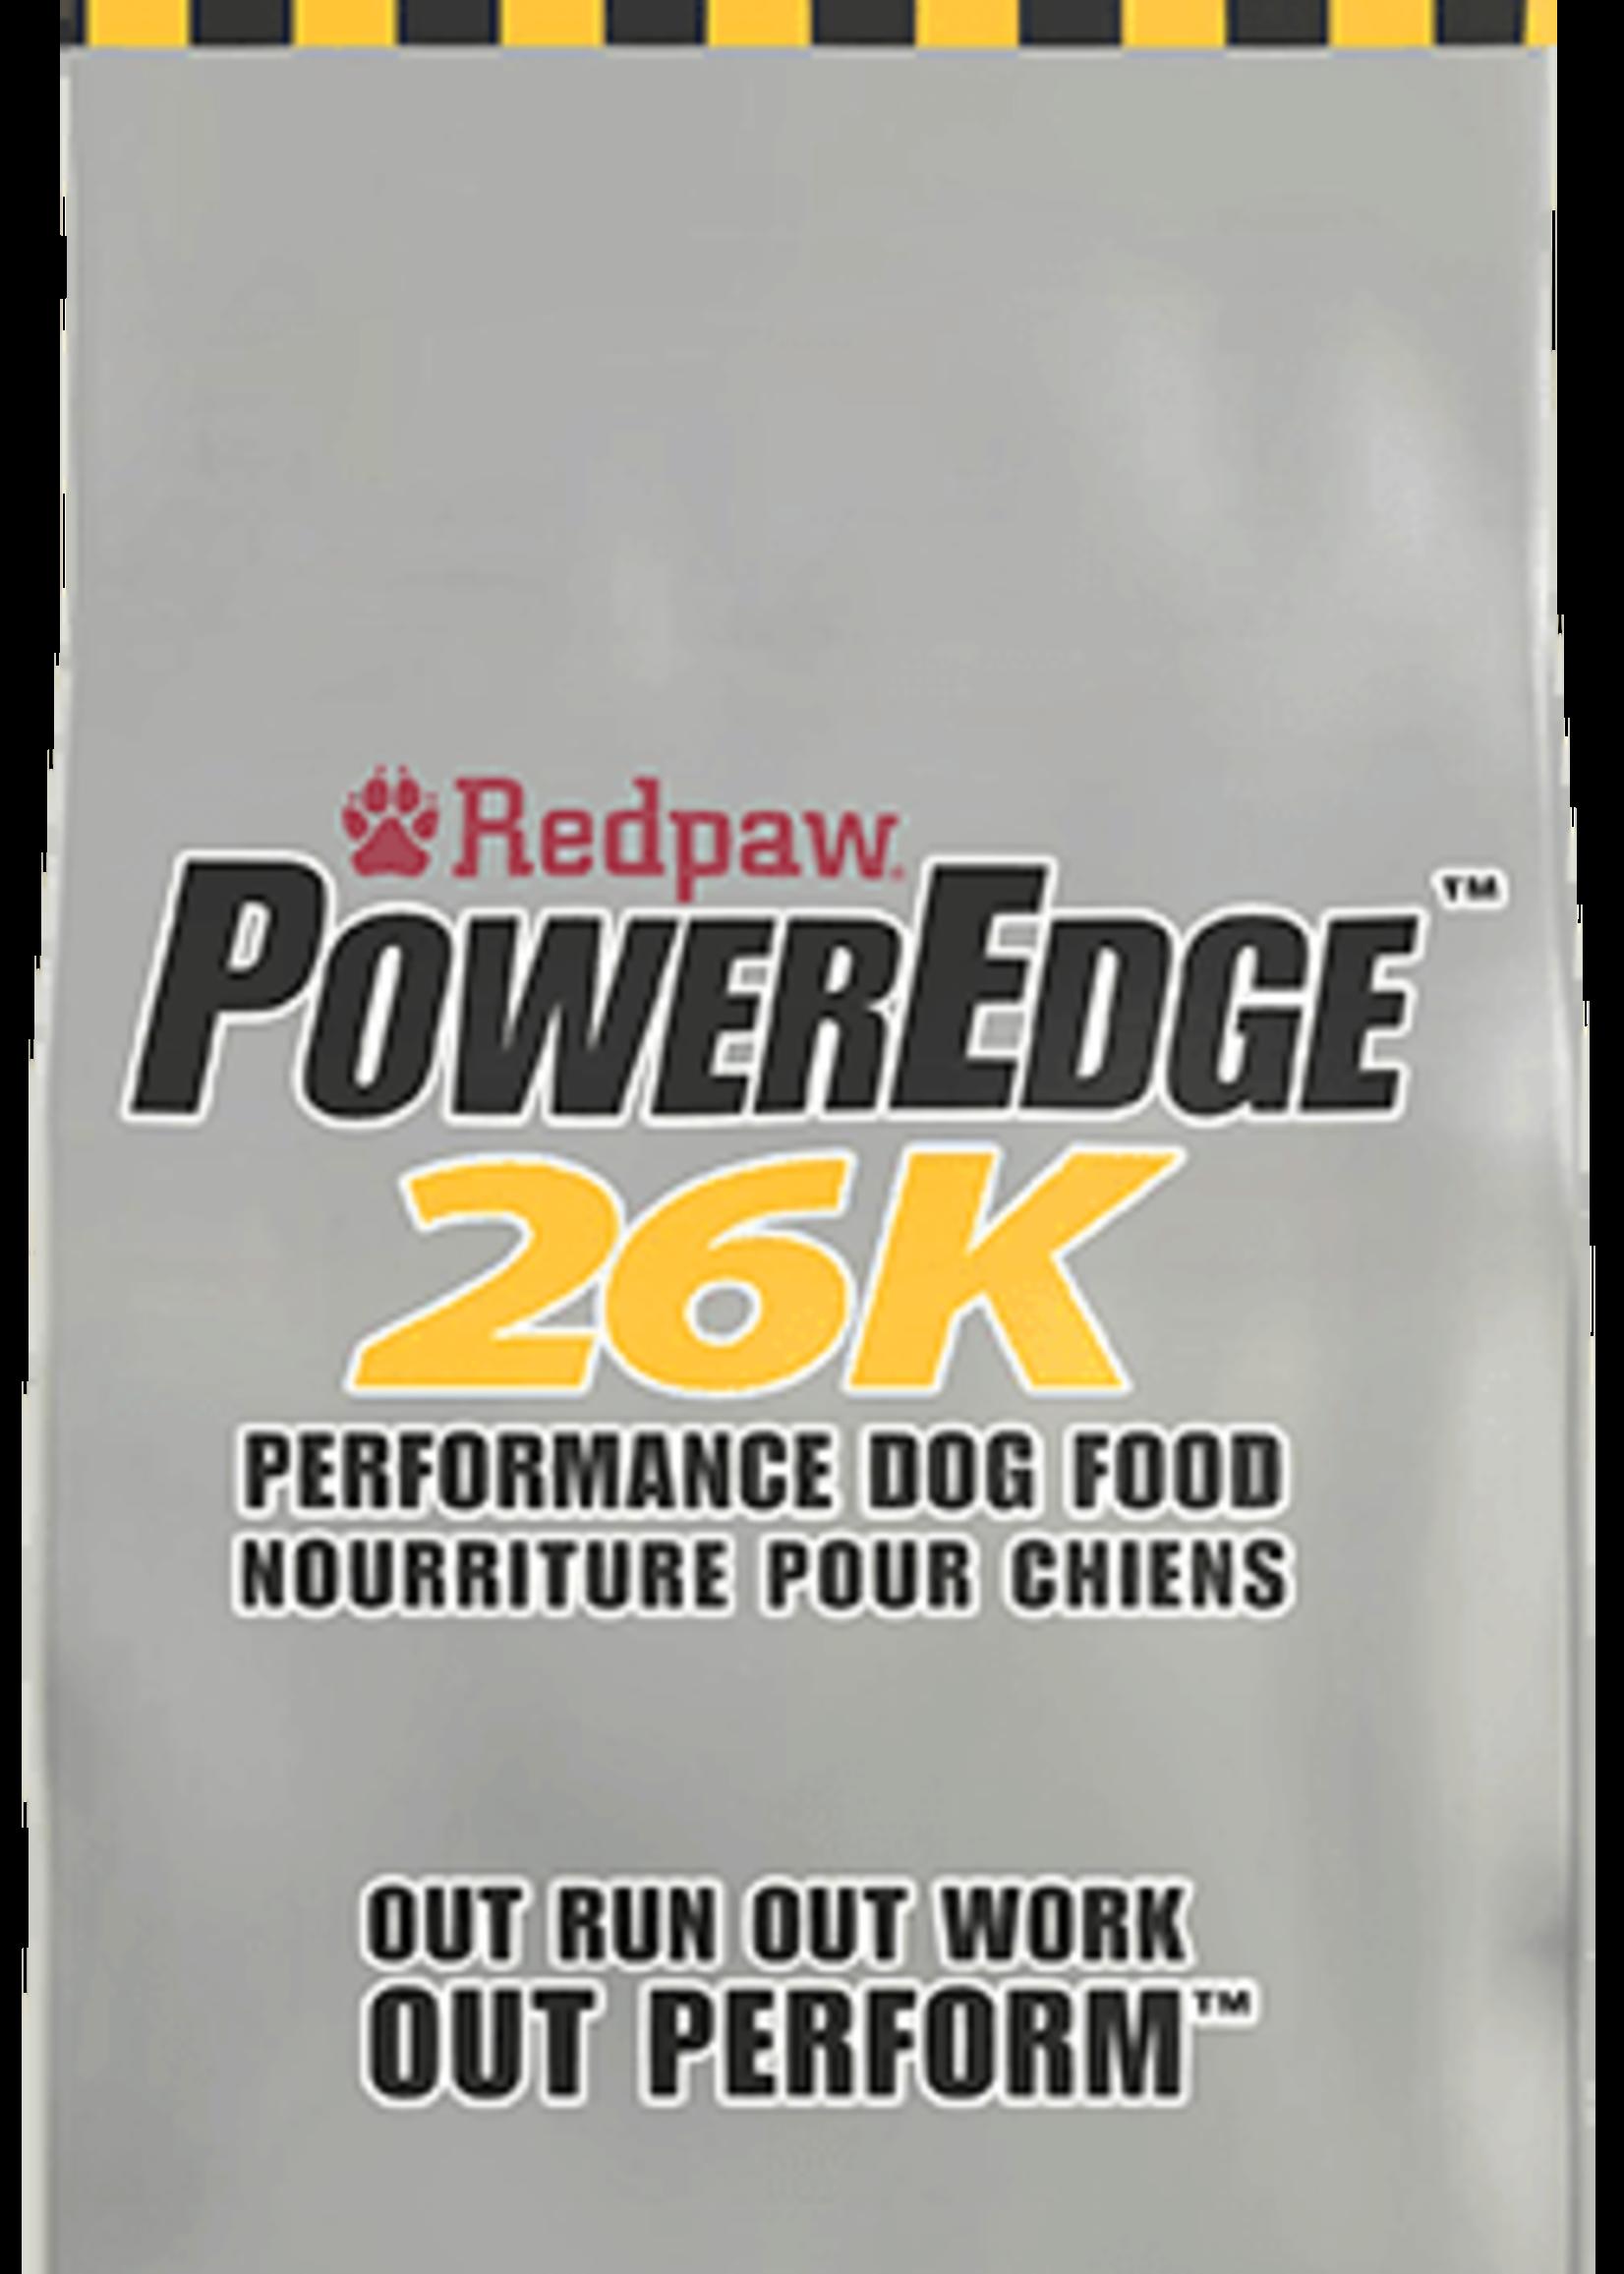 Redpaw Redpaw PowerEdge 26K 35lbs